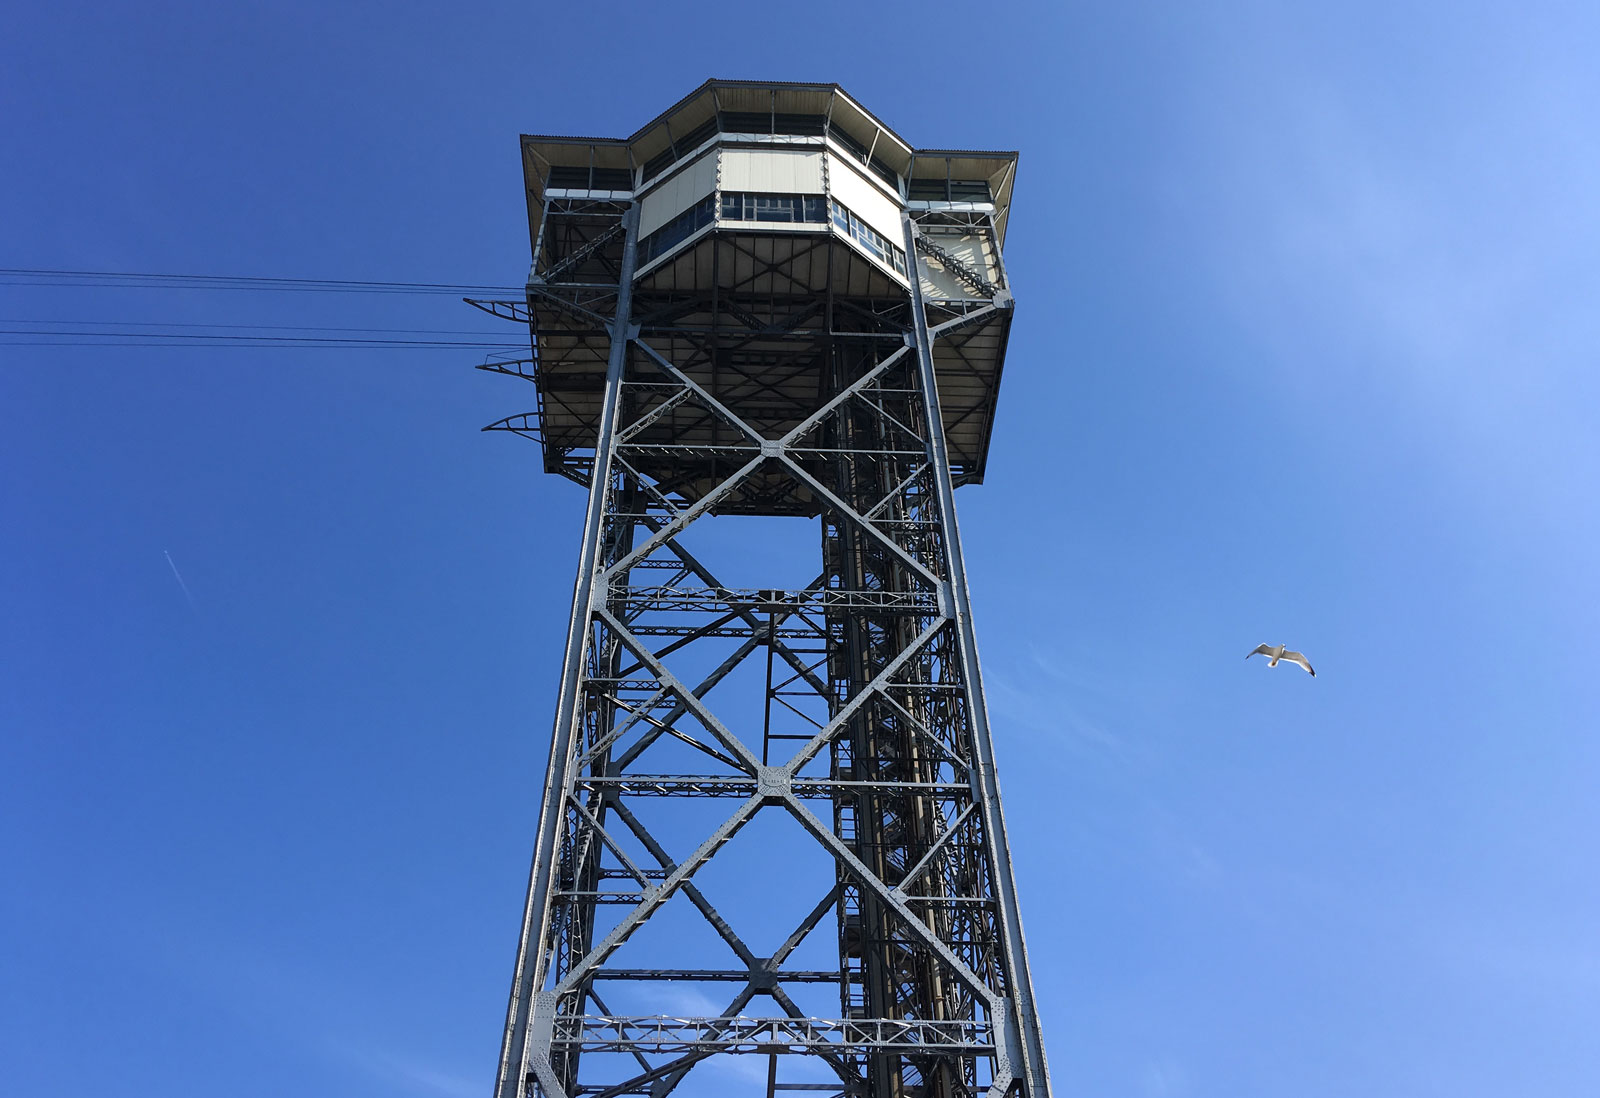 Torre del teleférico, Barceloneta, 19/05/2018